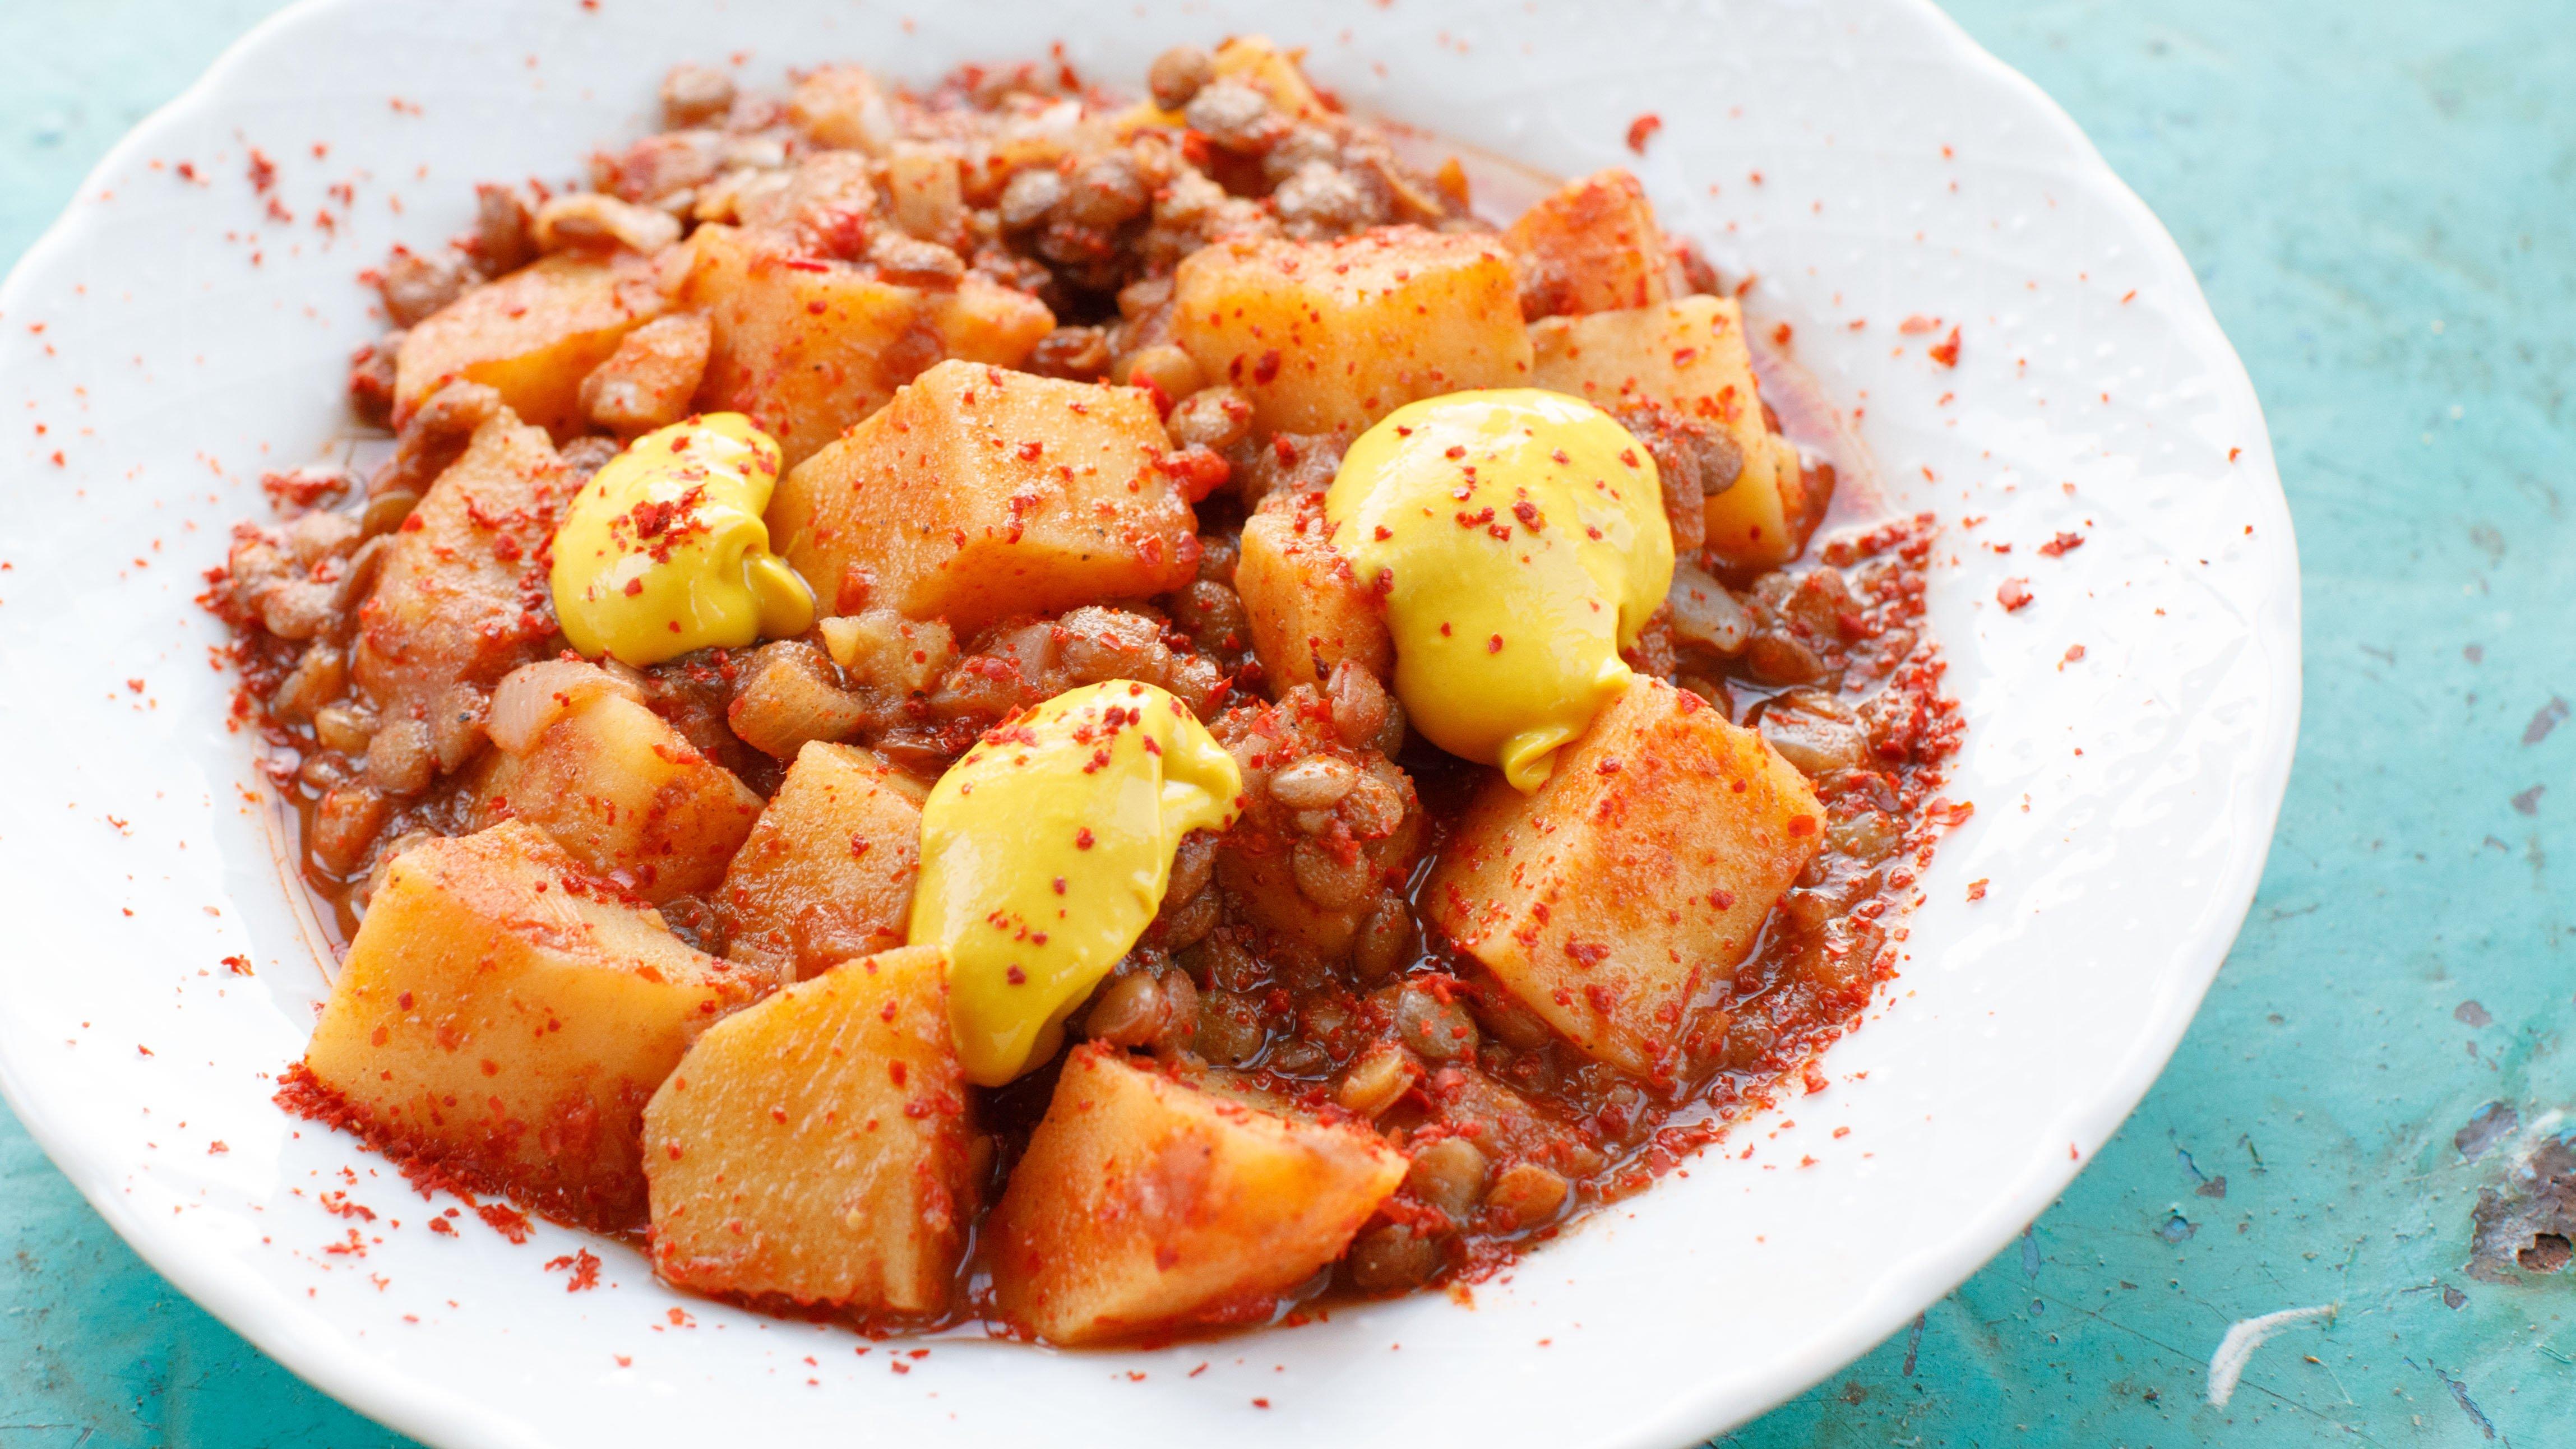 mercimekli-patates